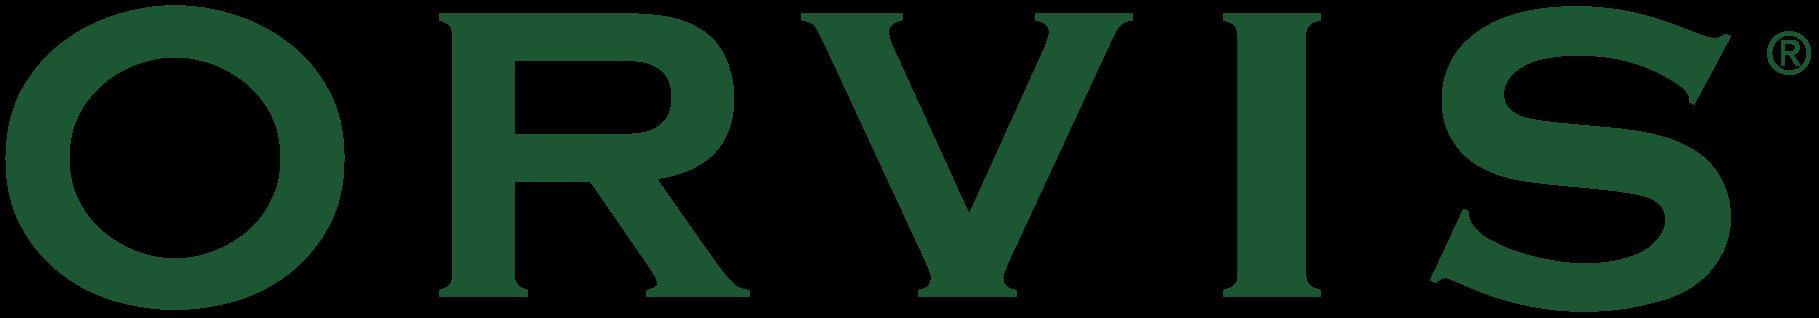 Orvis_Logo_Update.png